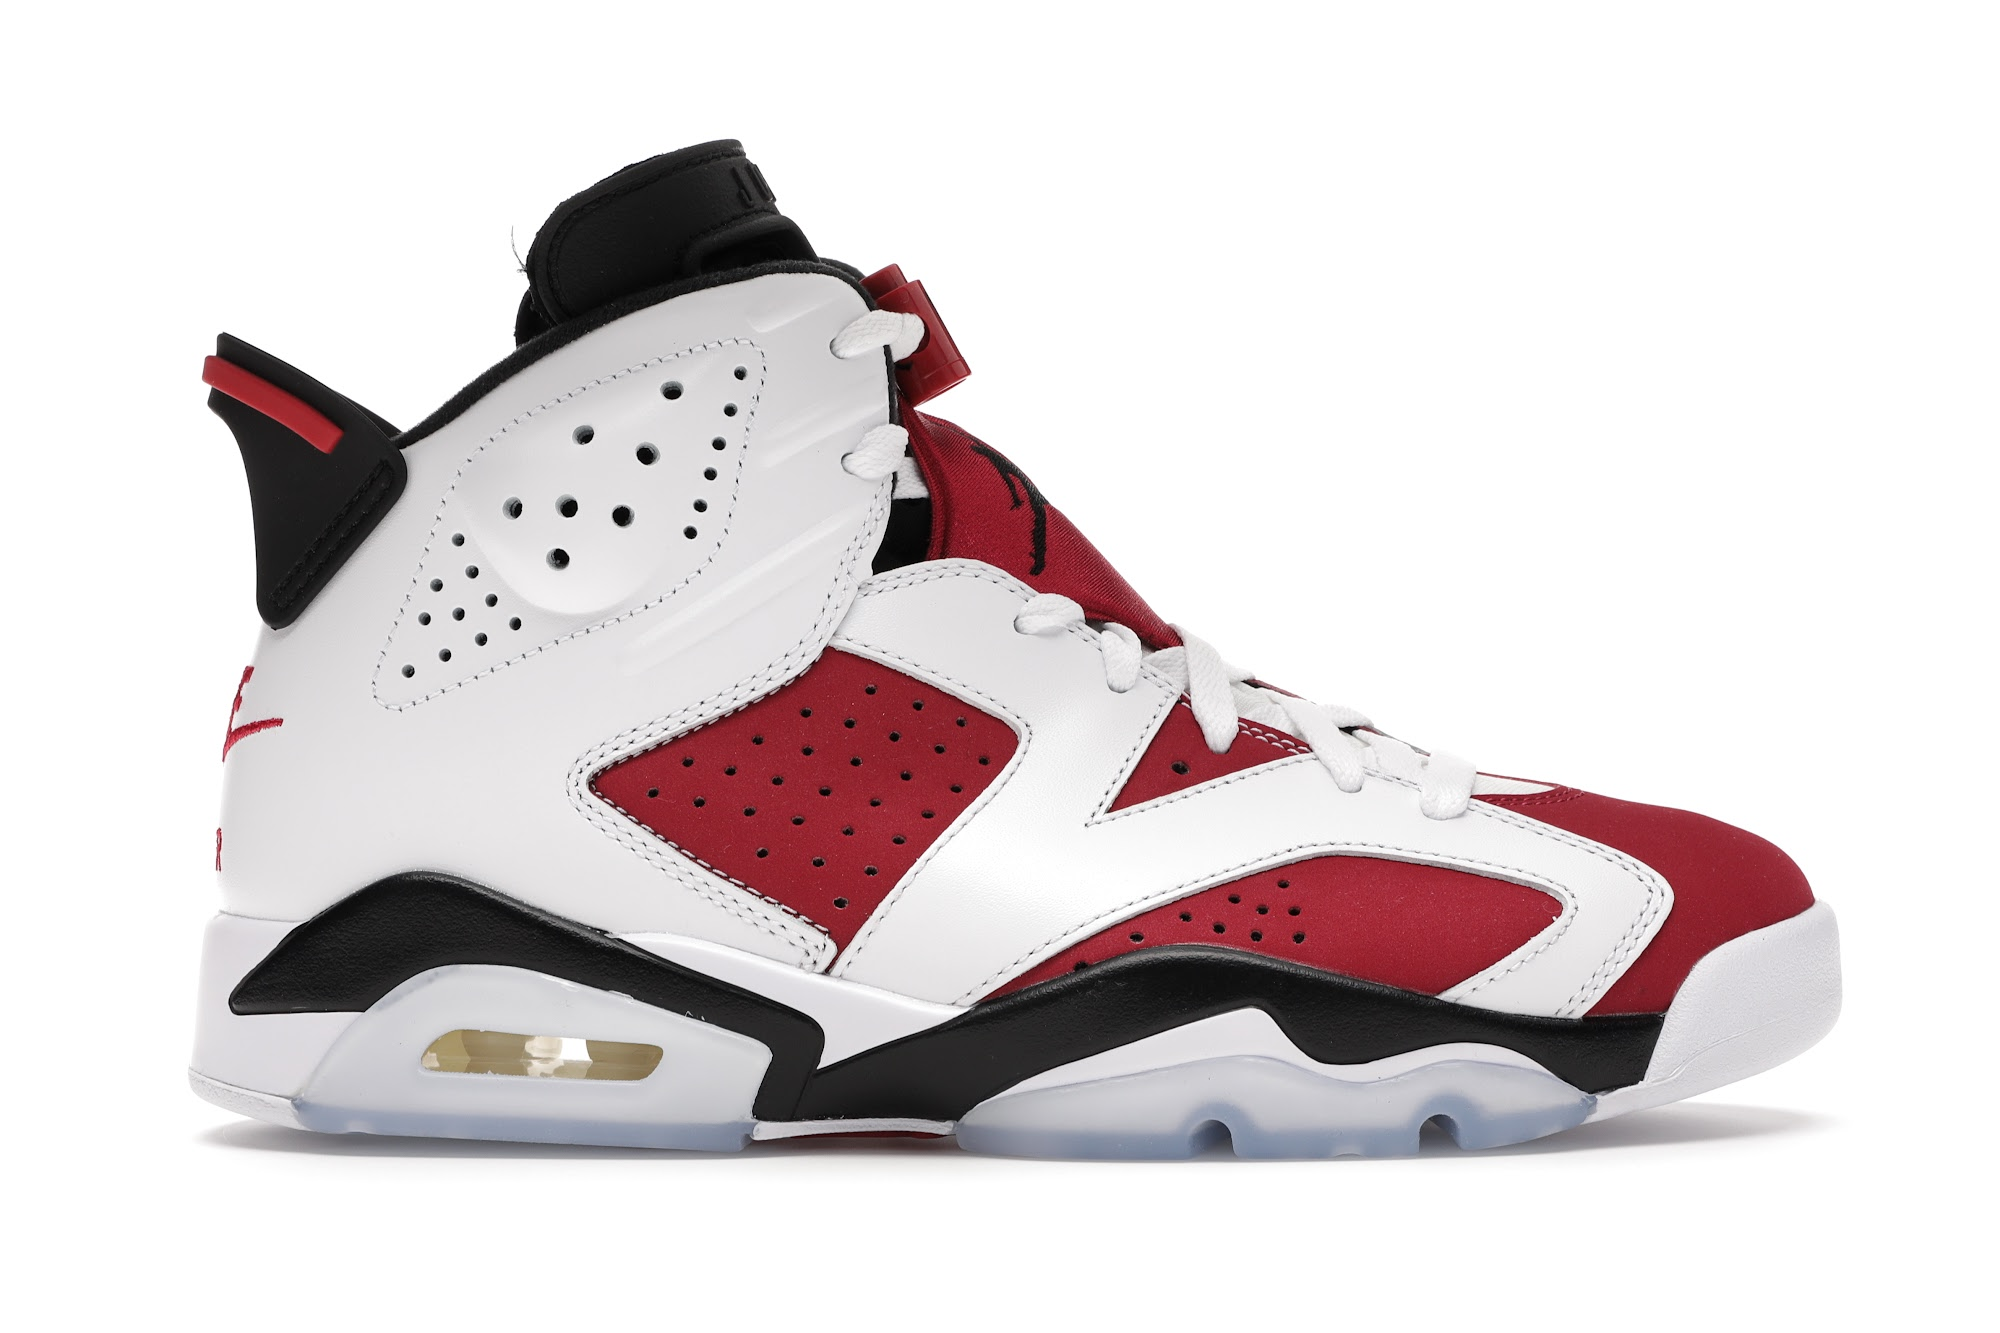 Jordan 6 Retro Carmine (2021) - CT8529-106